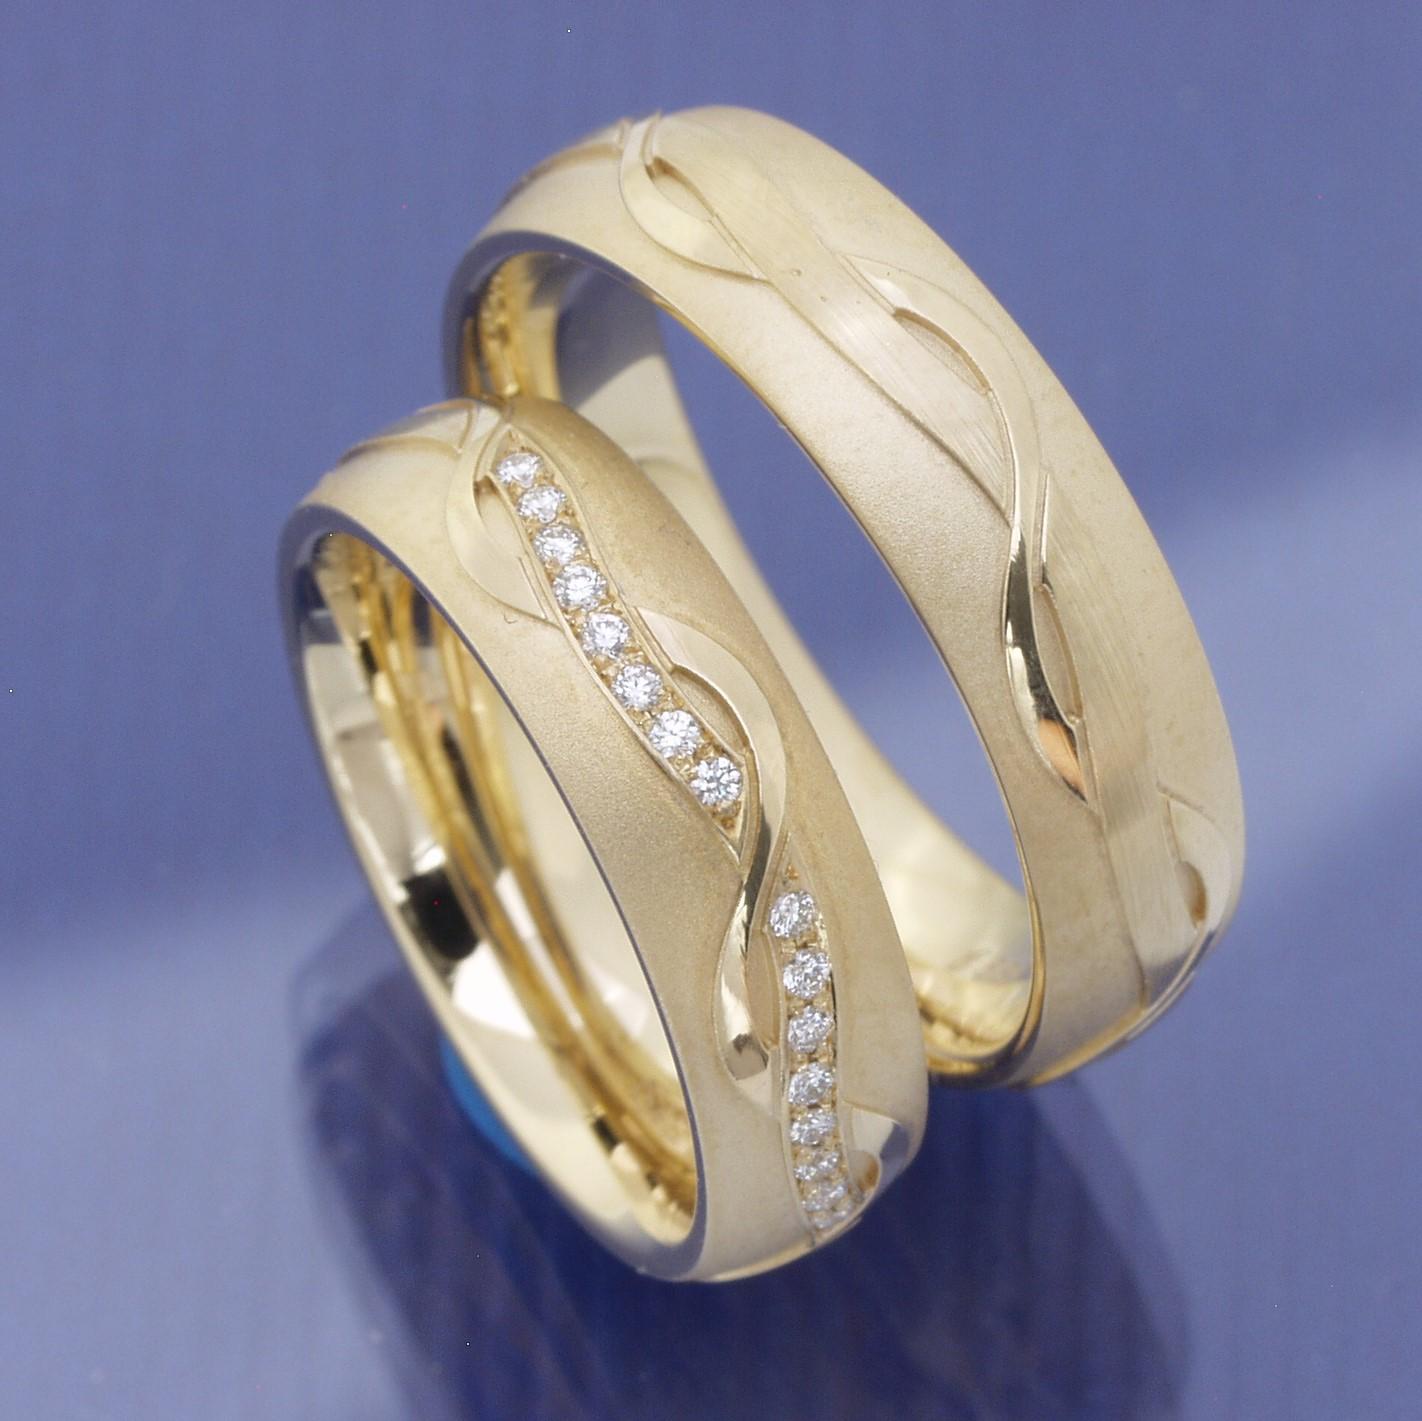 Eheringe Shop Hochzeitsringe Aus 585 Apricotgold P7074035